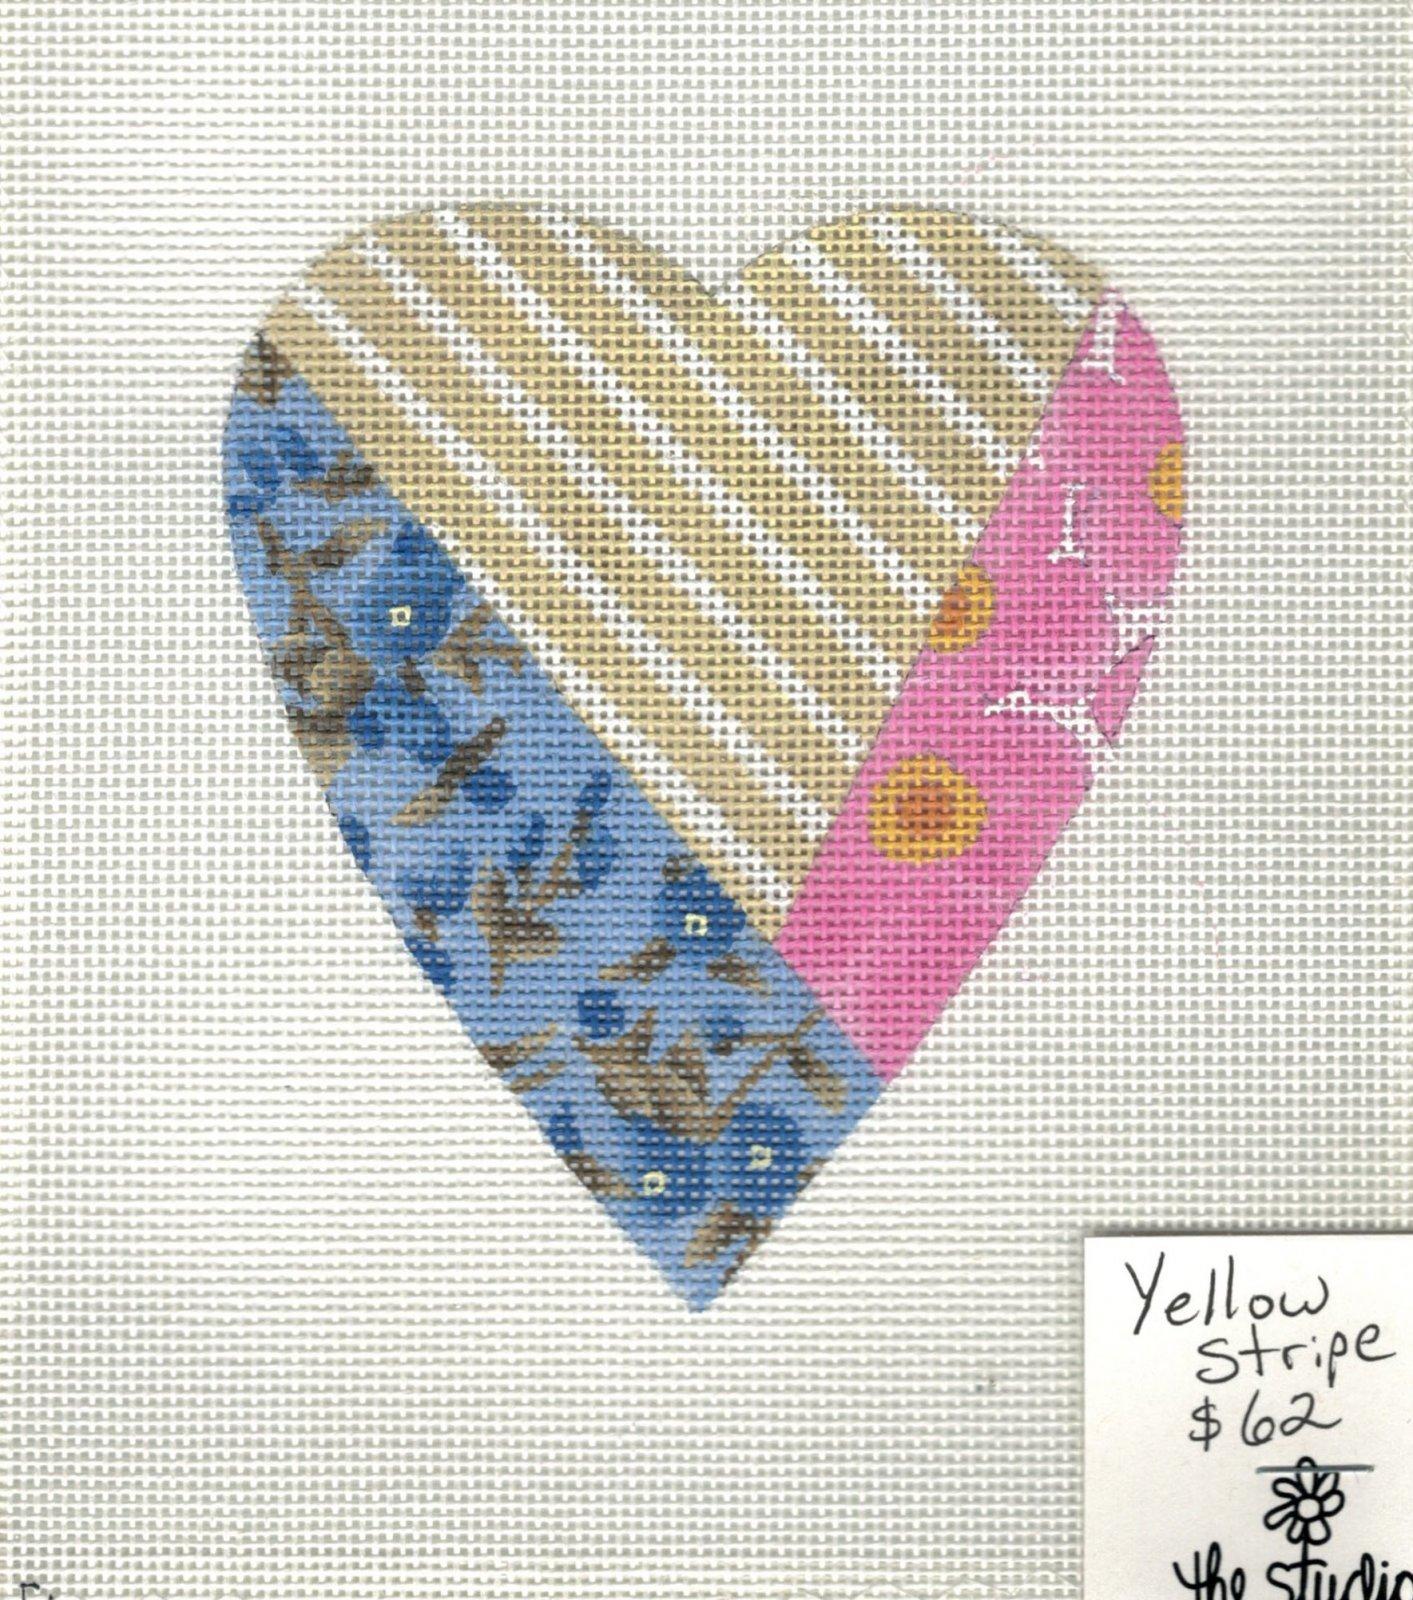 Yellow Stripe Heart - 18M